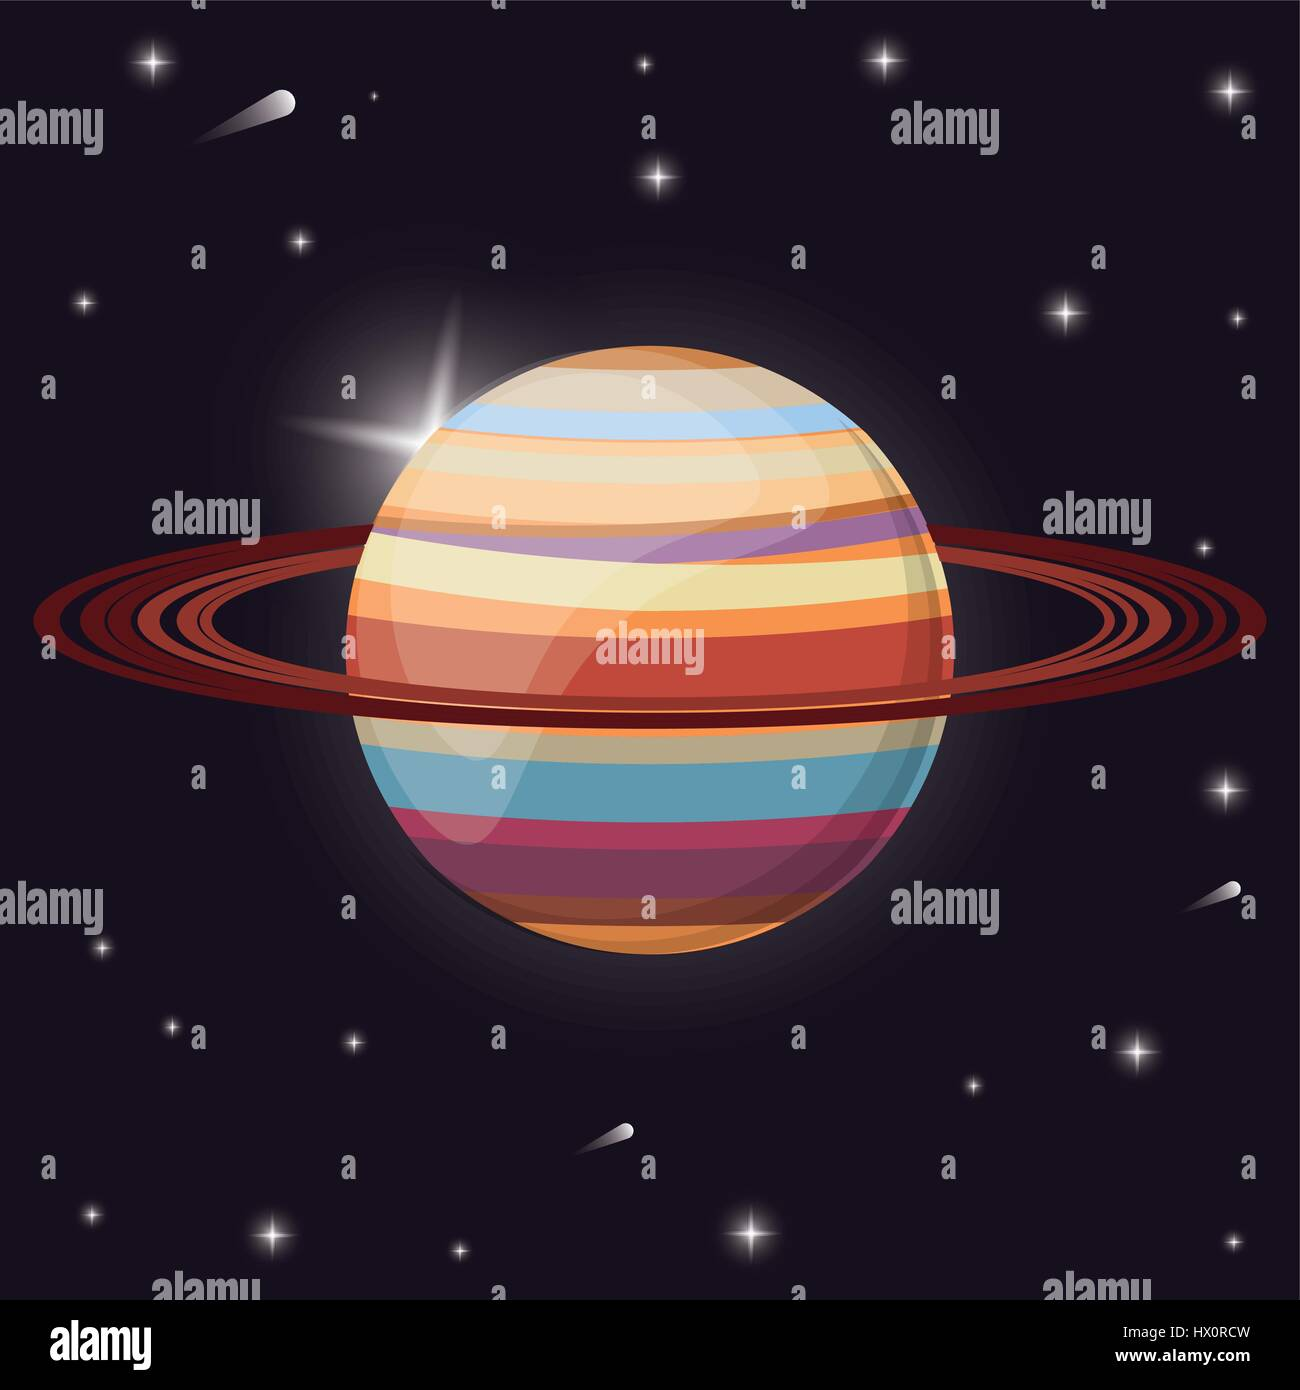 Solar System Orbits Stock Photos Amp Solar System Orbits Stock Images